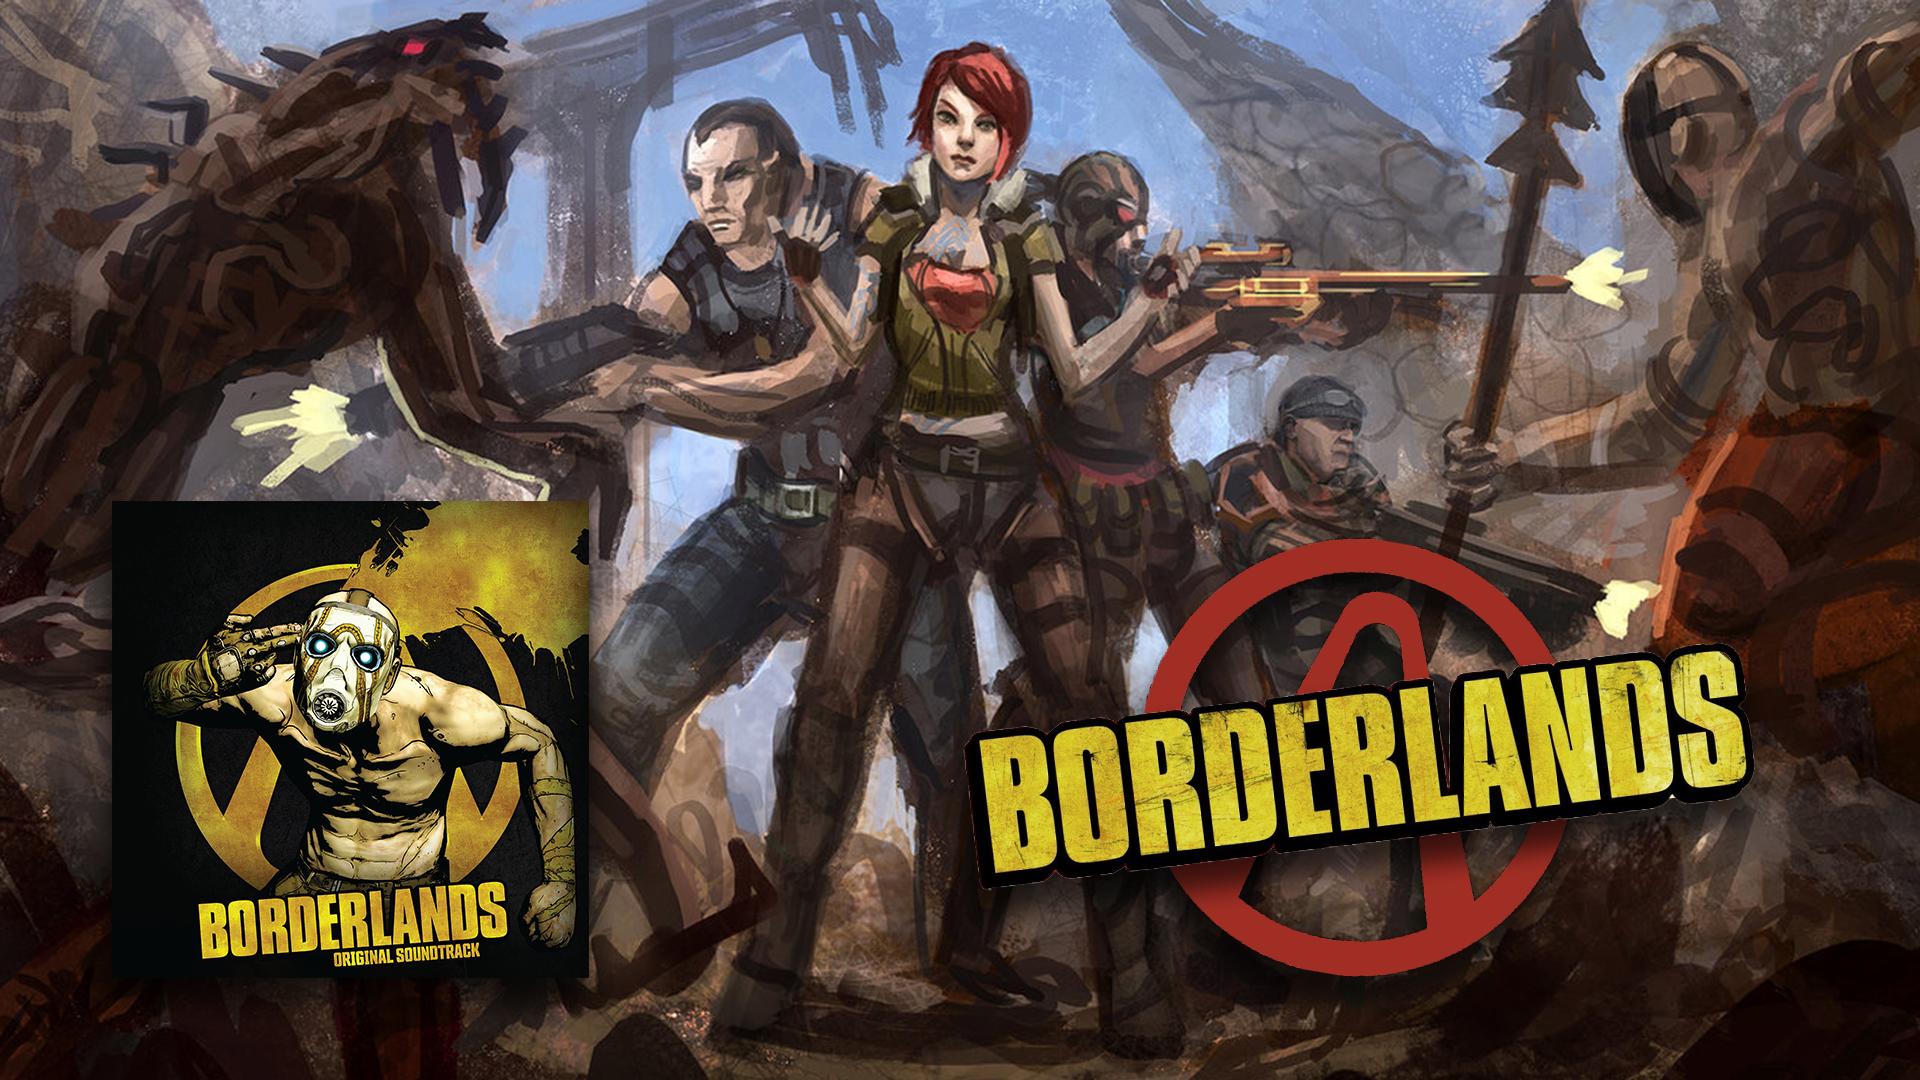 Borderlands1 Cover Just For Games